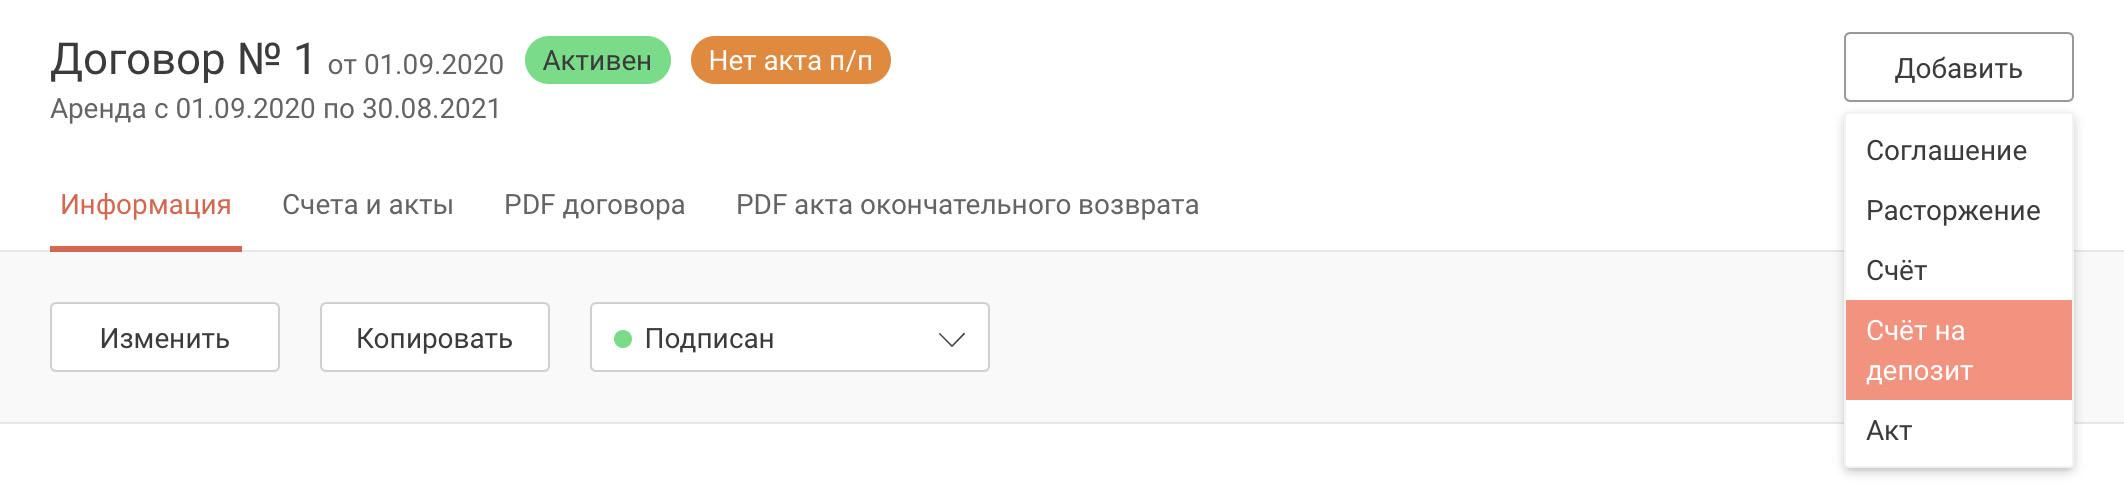 Скриншот: Счет на депозит